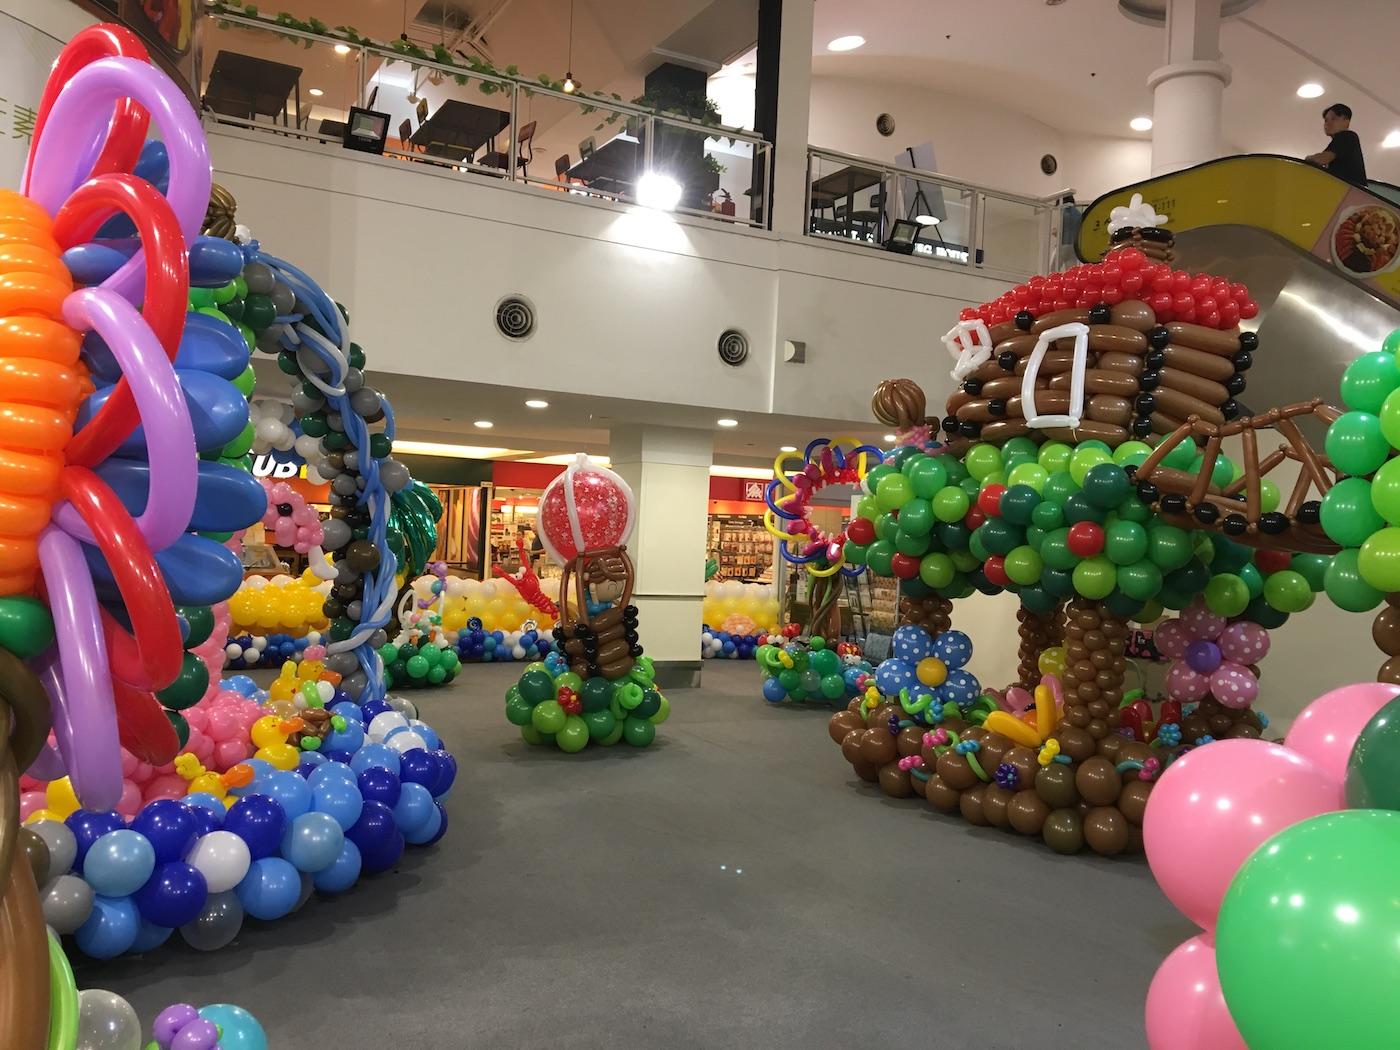 Shopping Mall Balloon Exhibition That Balloons